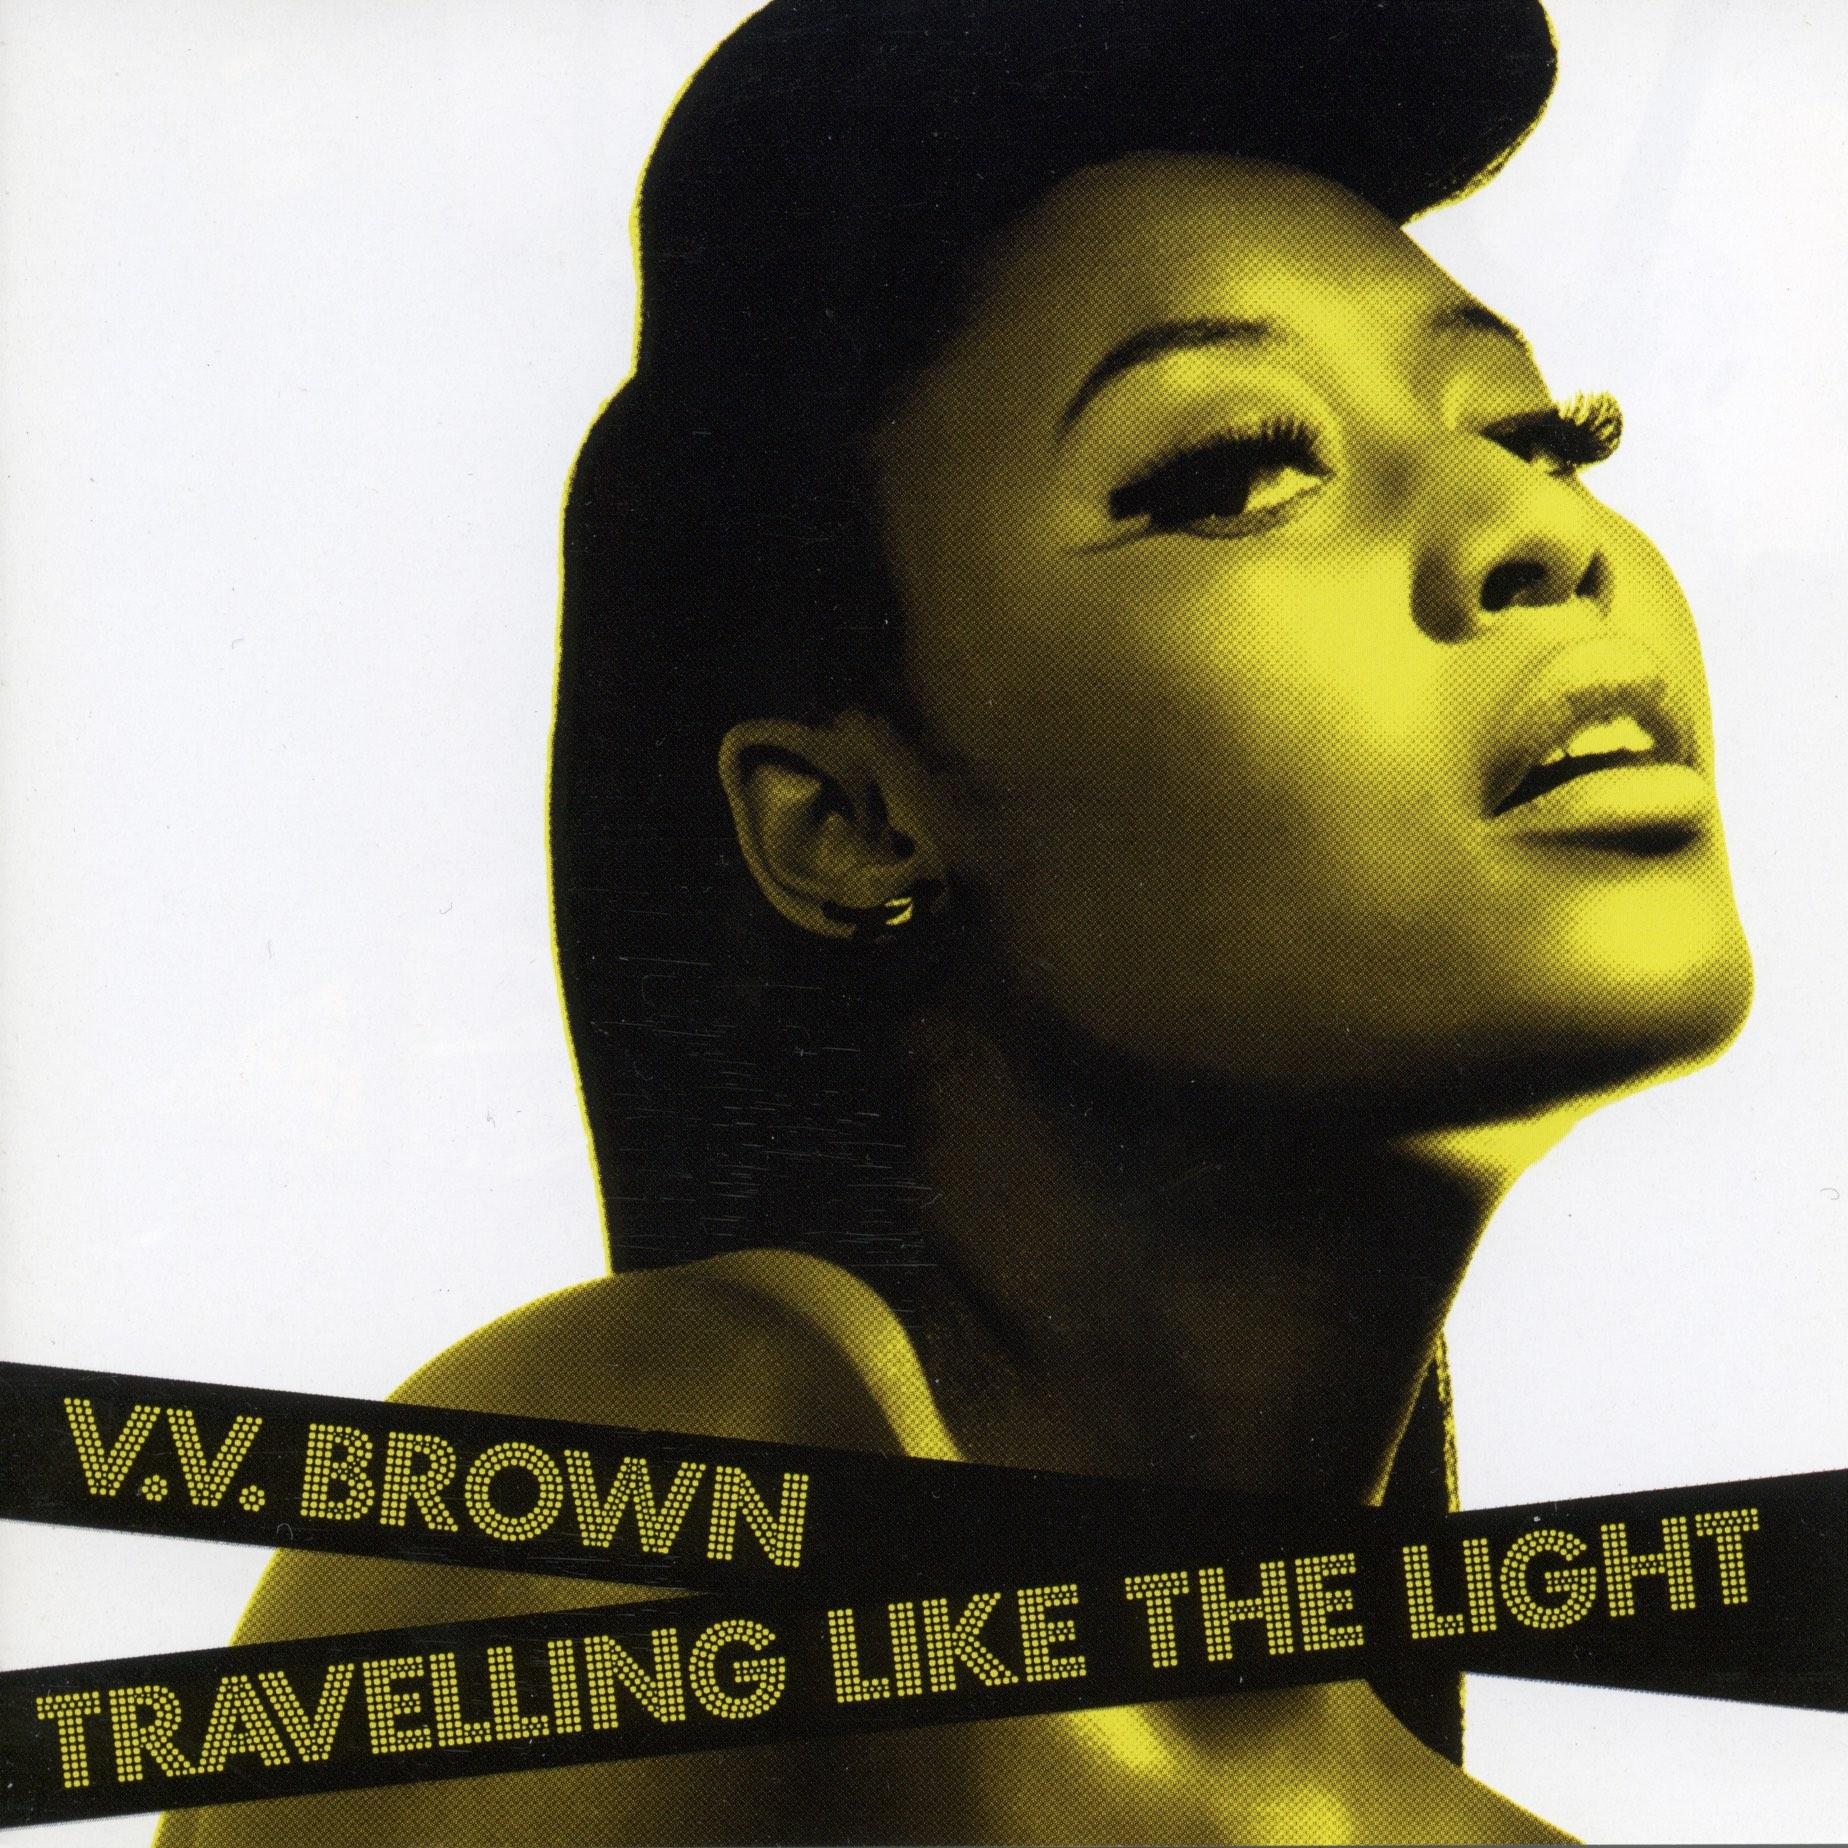 2009 - V.V. Brown